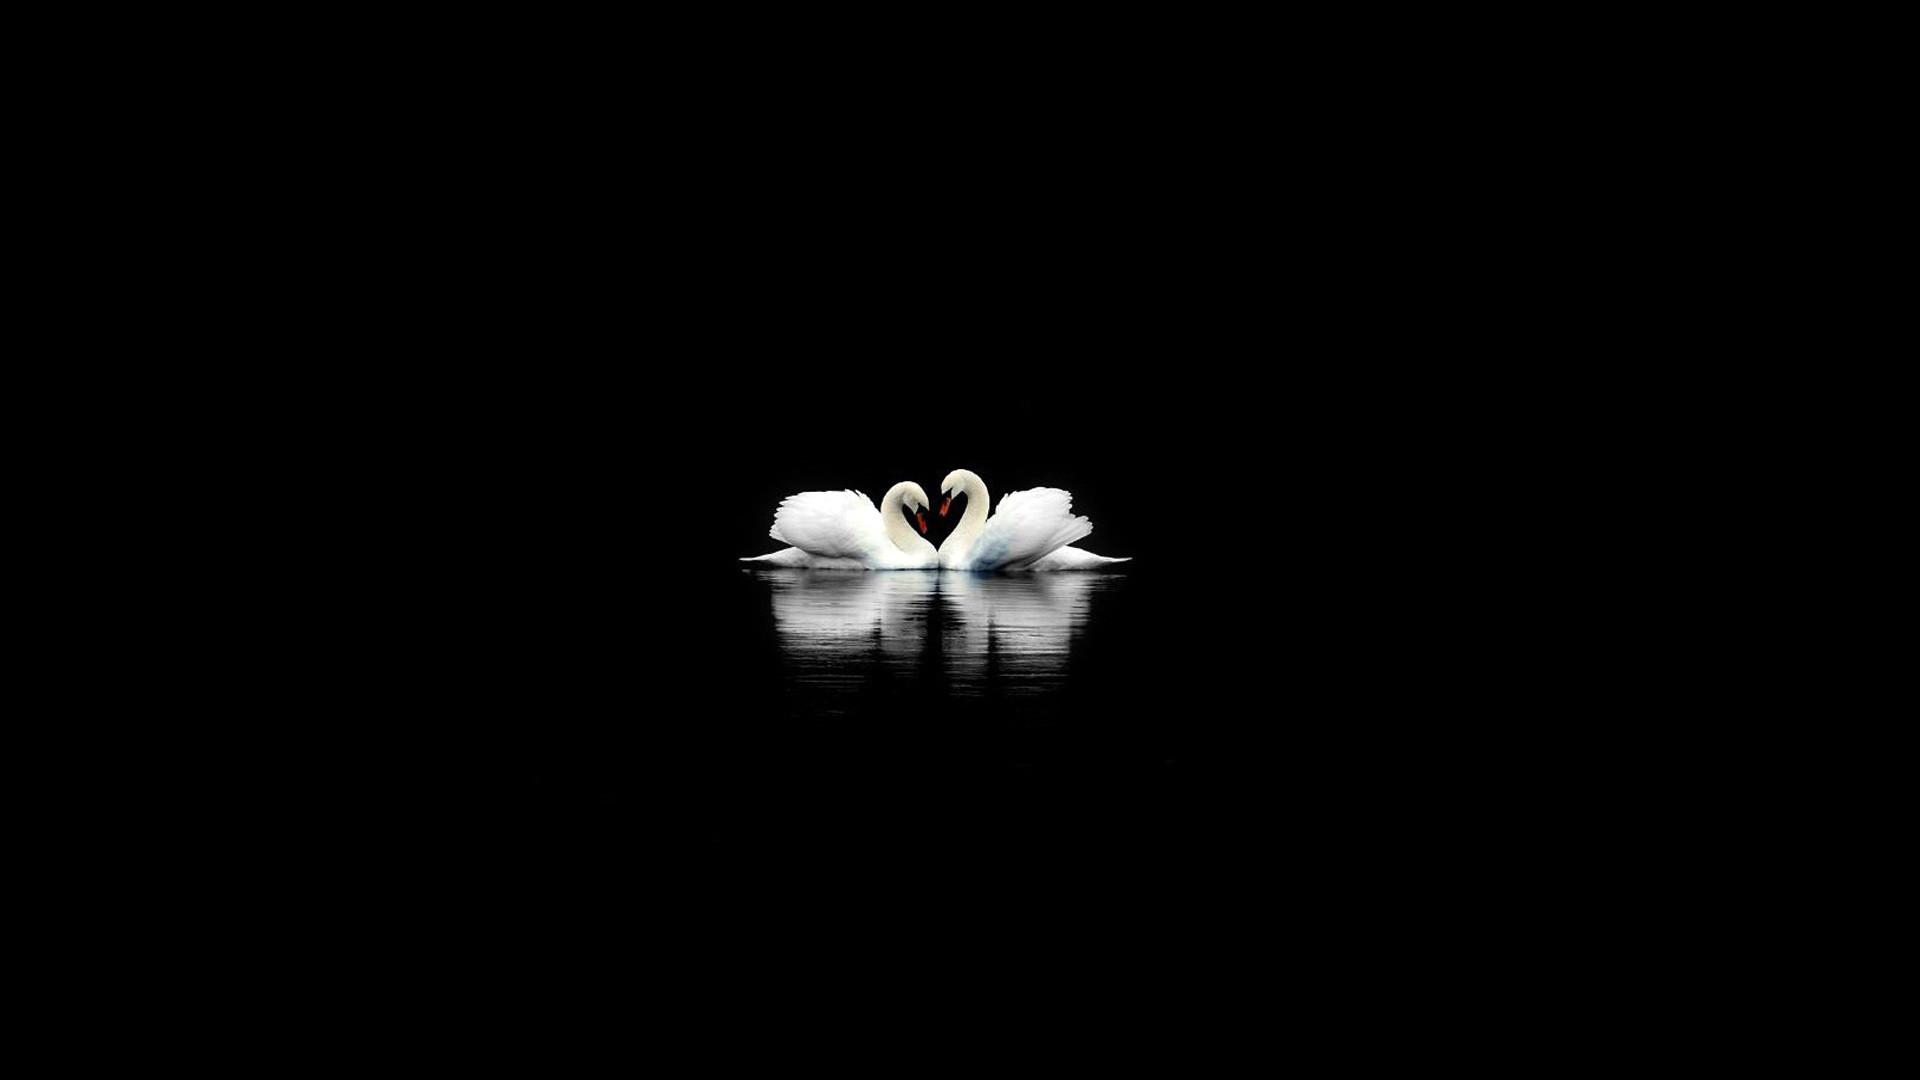 Black and White 1080p Wallpaper